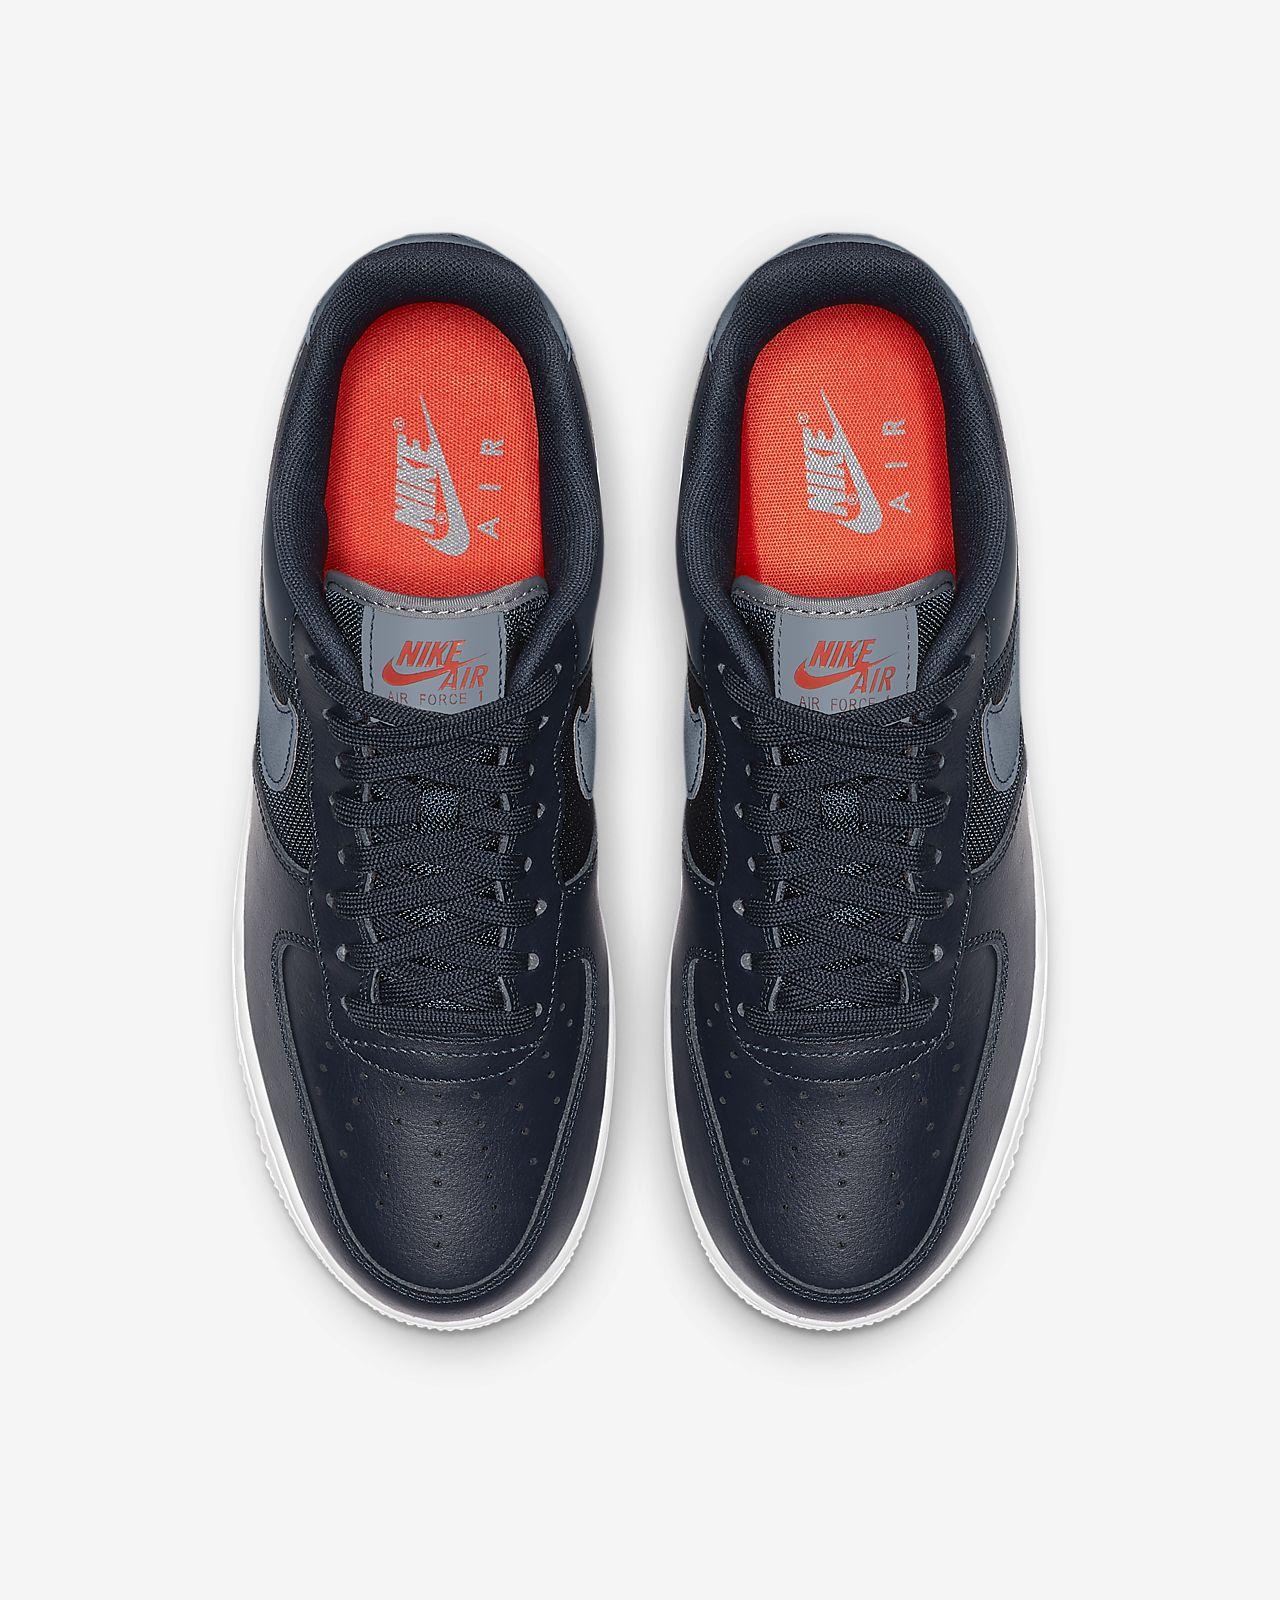 0ebc756e94af Nike Air Force 1  07 LV8 Men s Shoe. Nike.com AU